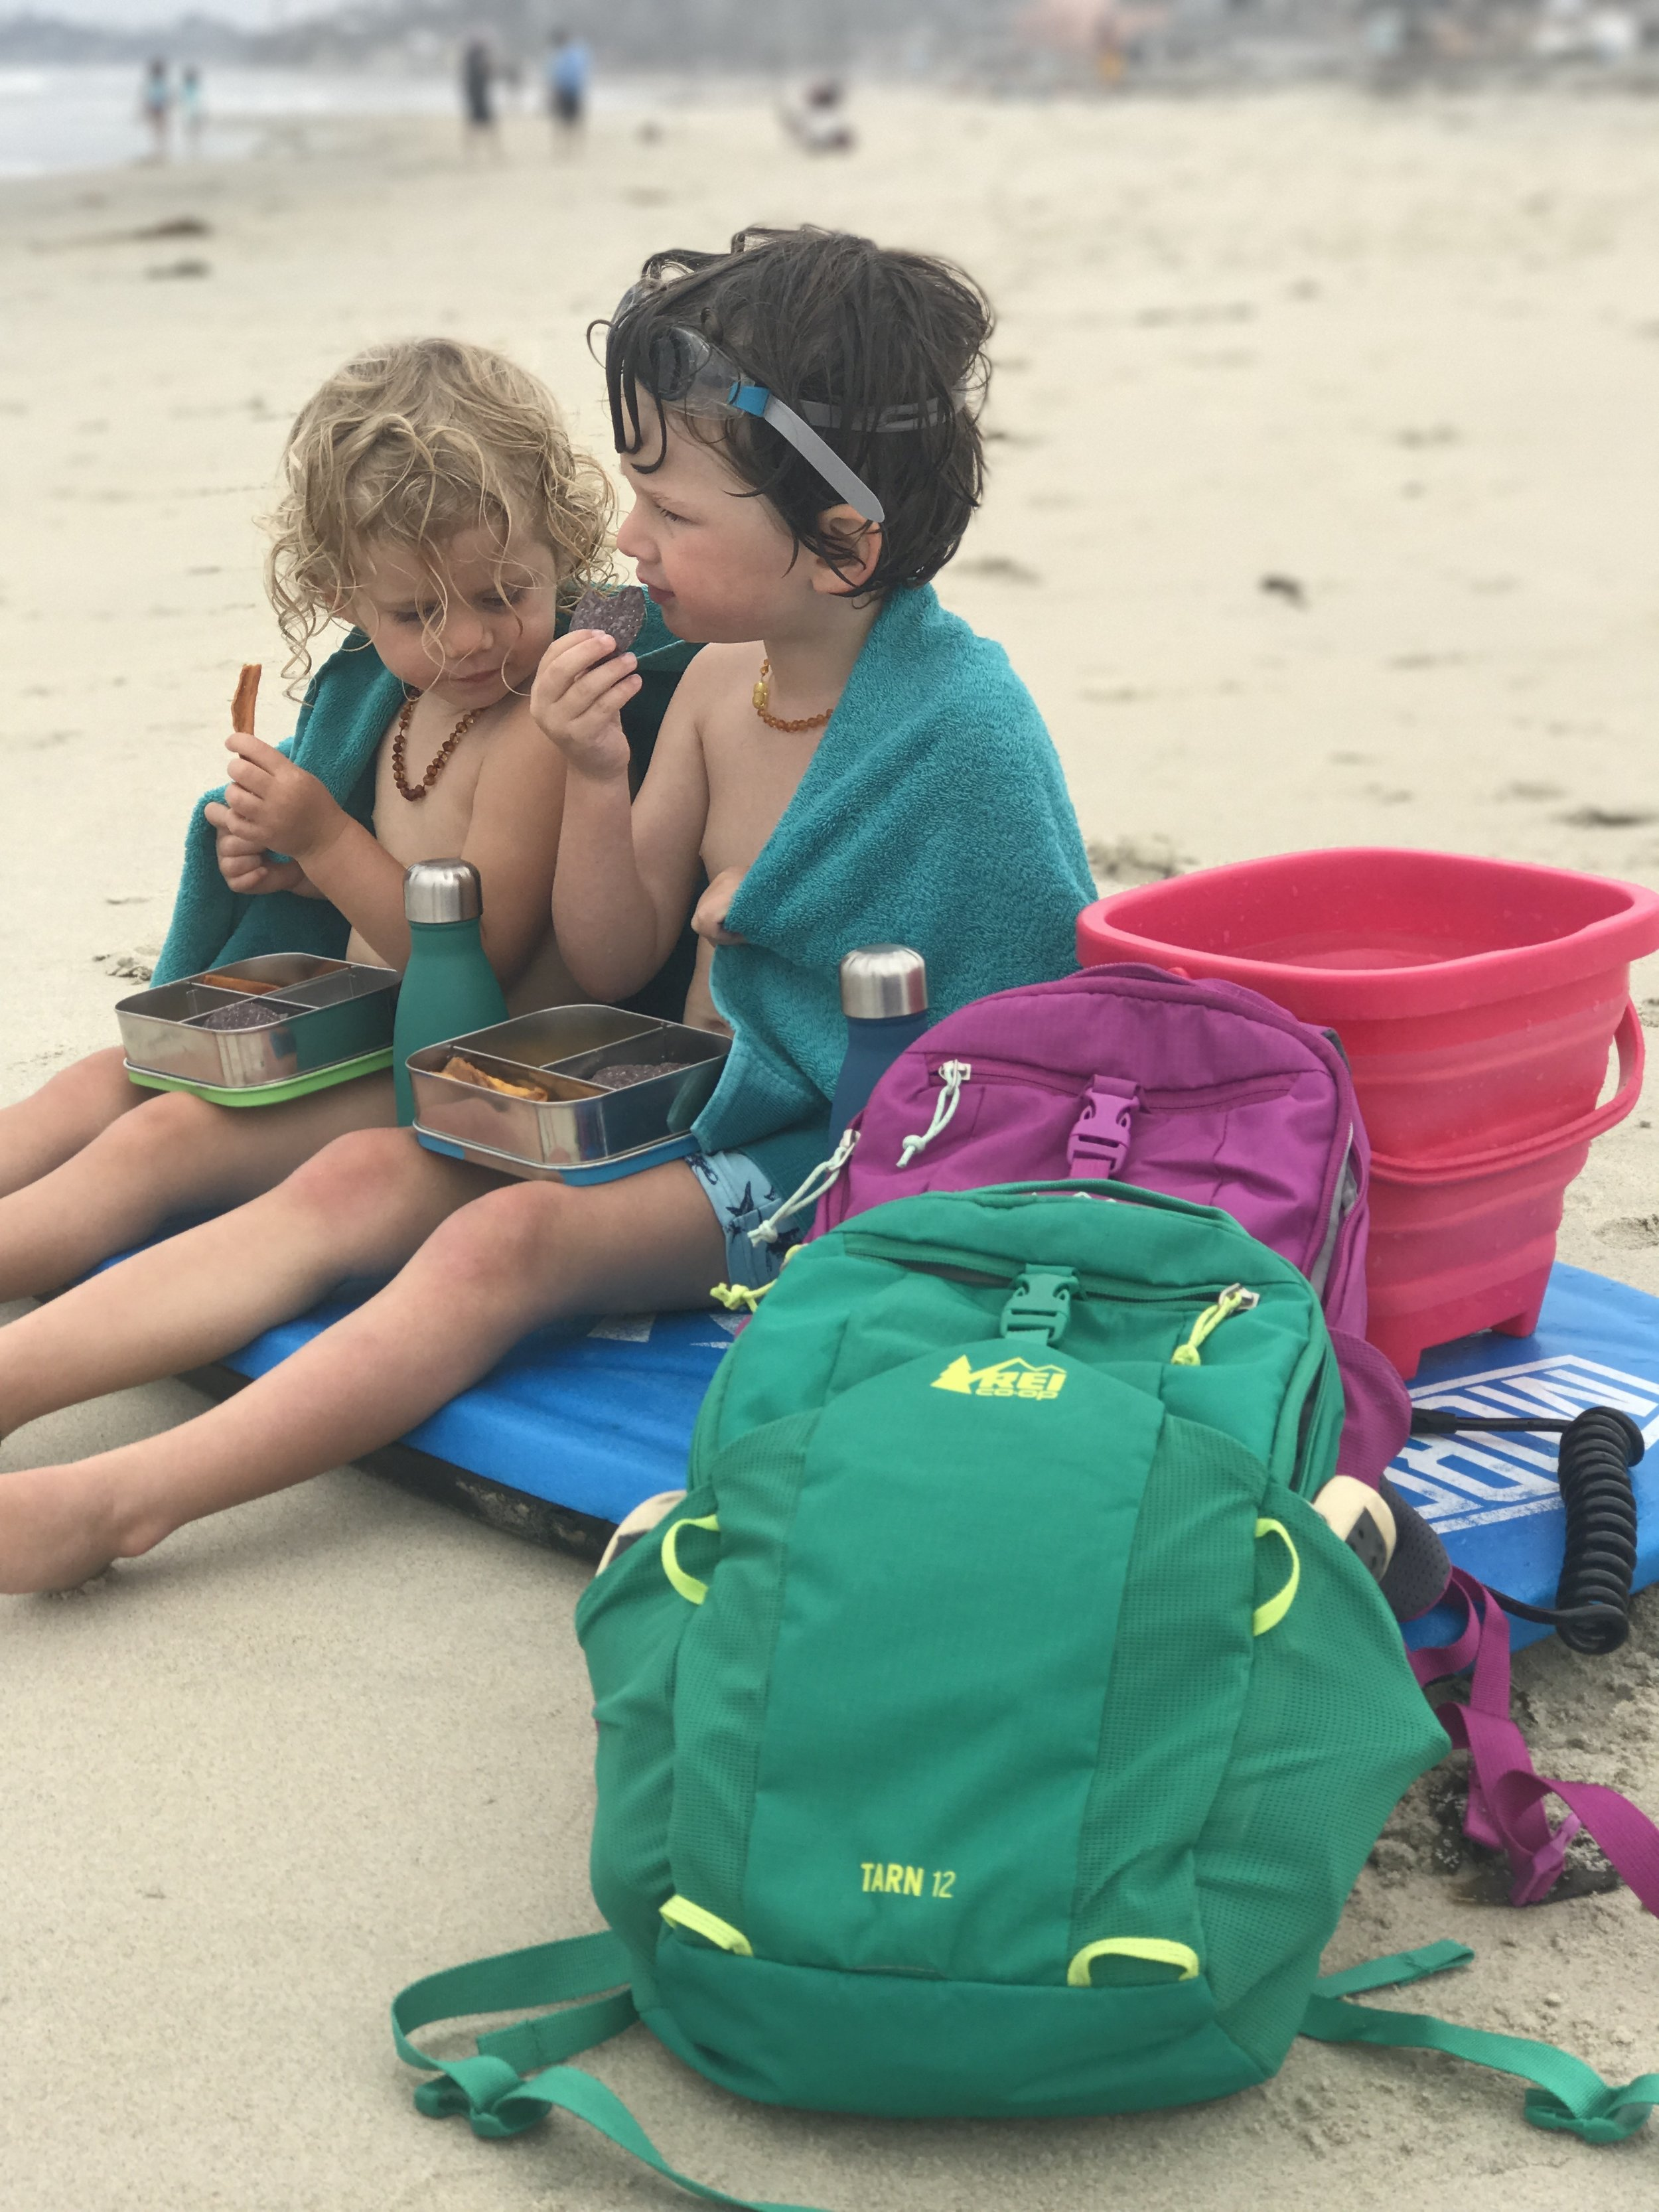 Boobie Boarding, Snacks, and Backpacks